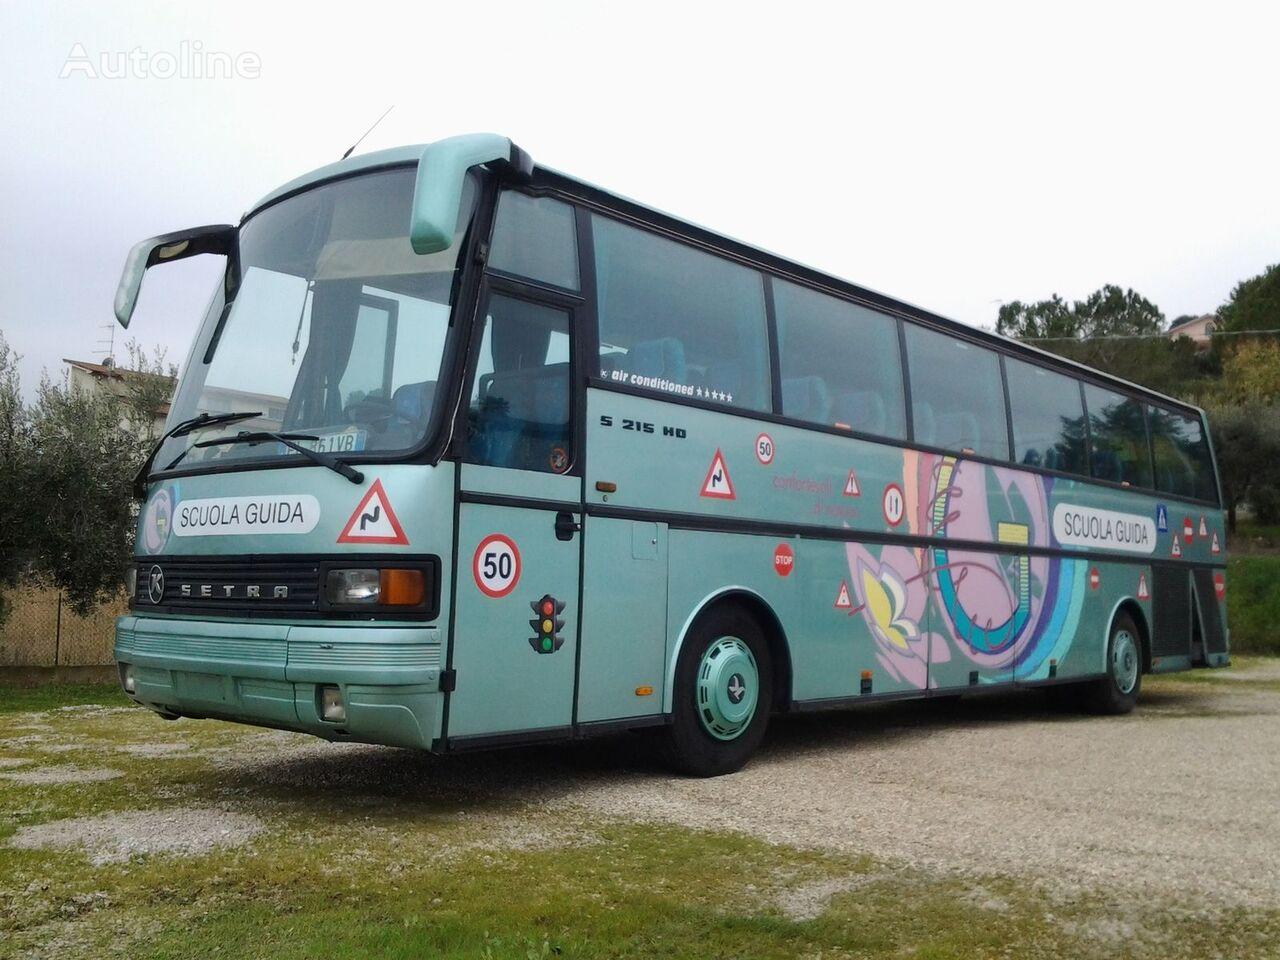 SETRA SCUOLA GUIDA / AUTOSCUOLA coach bus